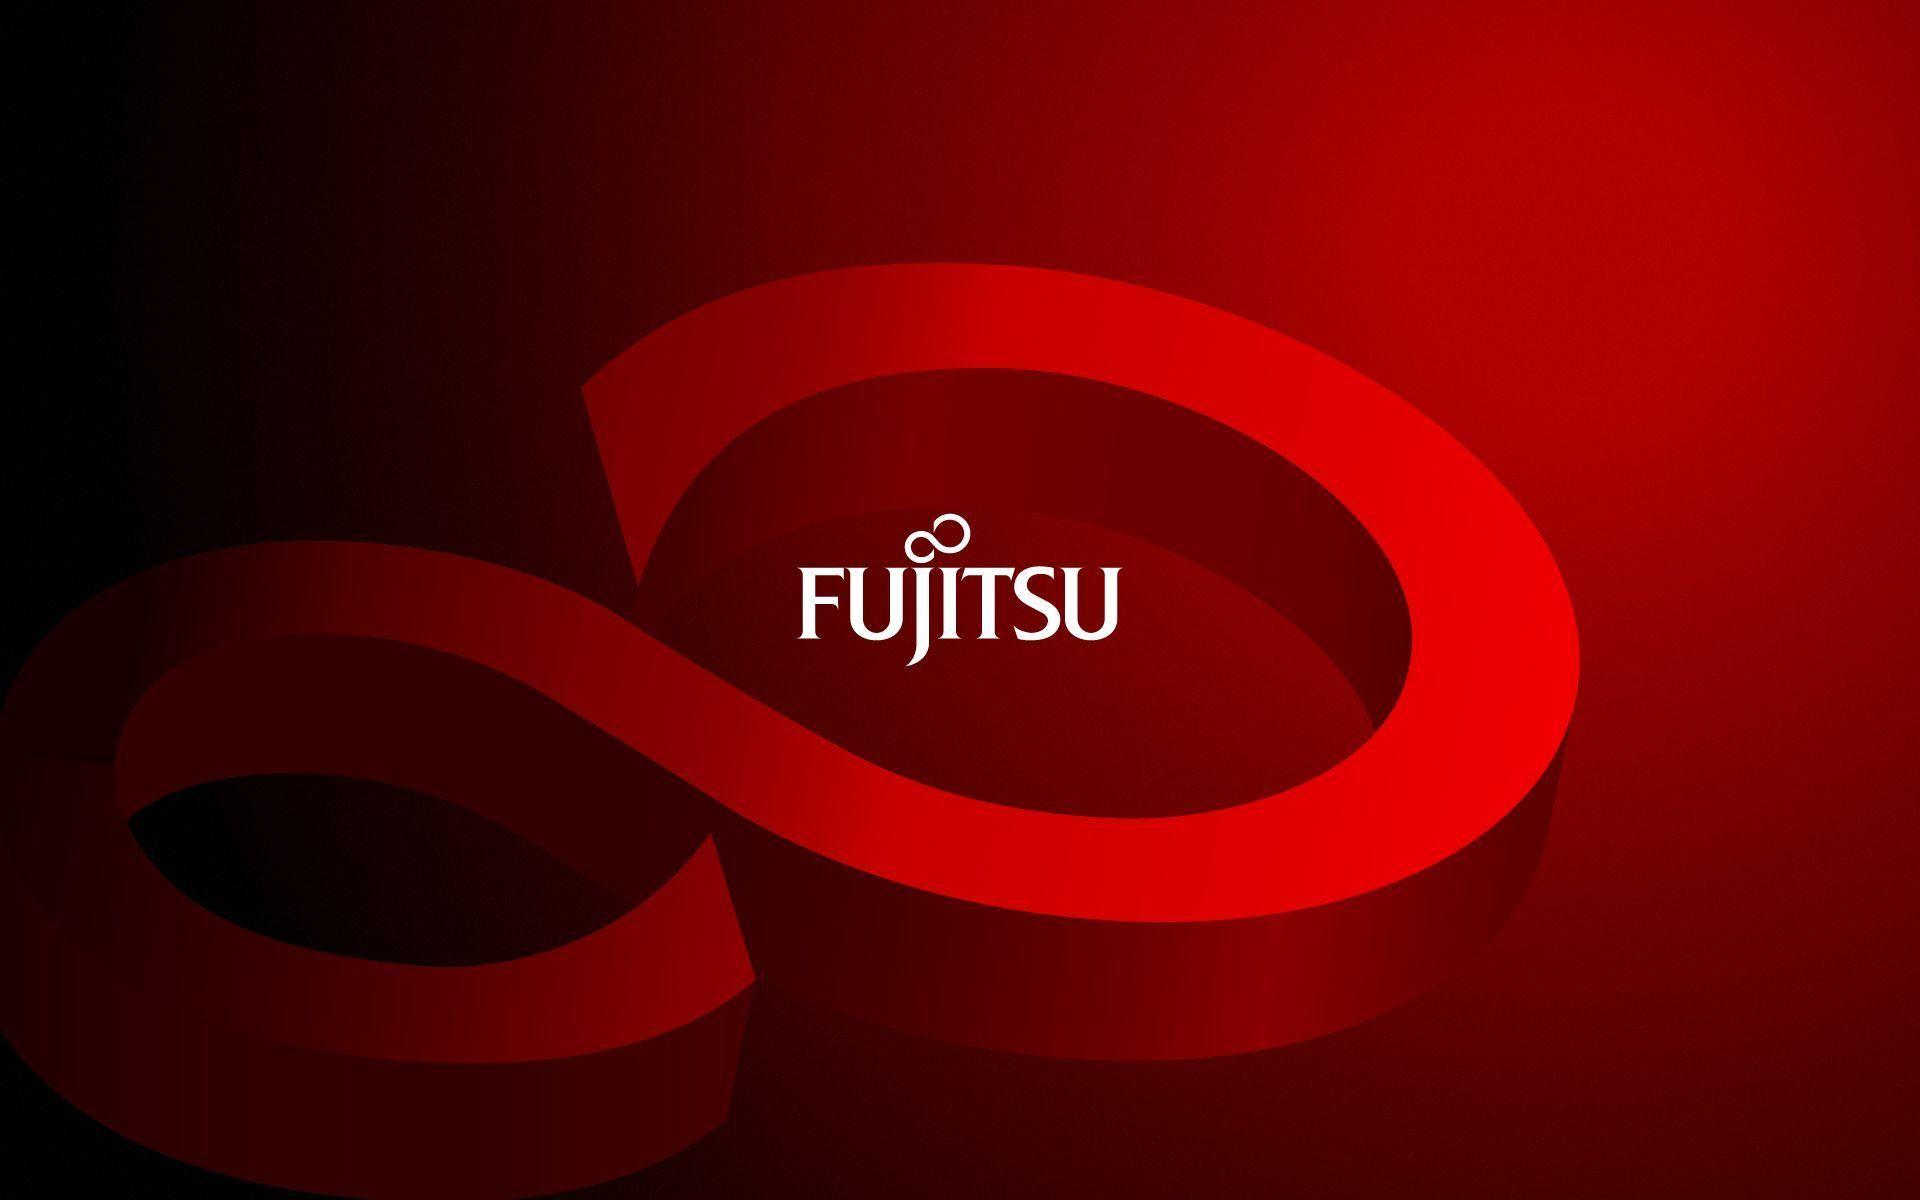 Fujitsu Wallpapers Hd